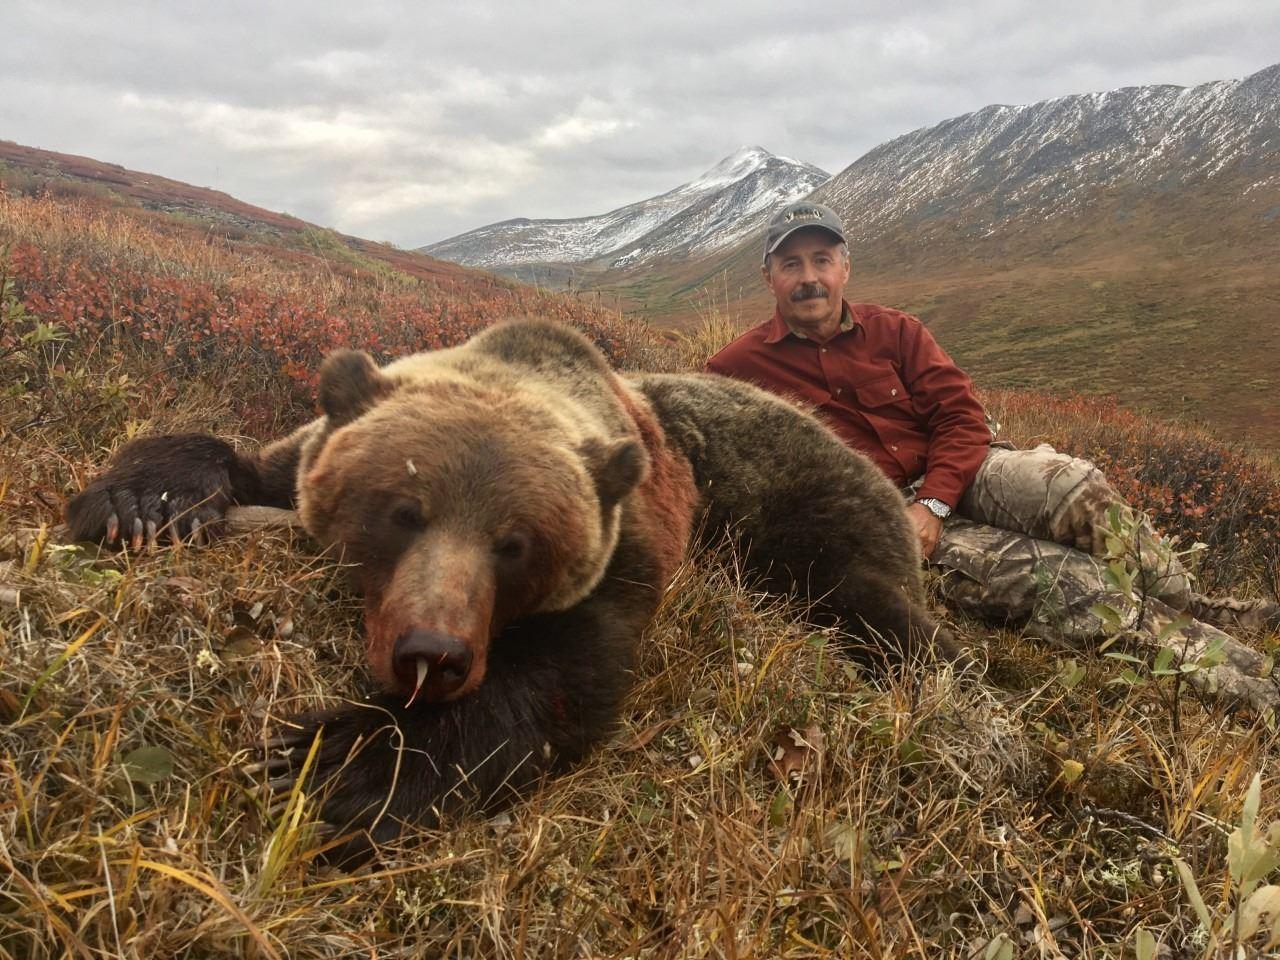 Hunter Day Yukon >> 10 Day Grizzly Bear Hunt For 1 Hunter In The Yukon